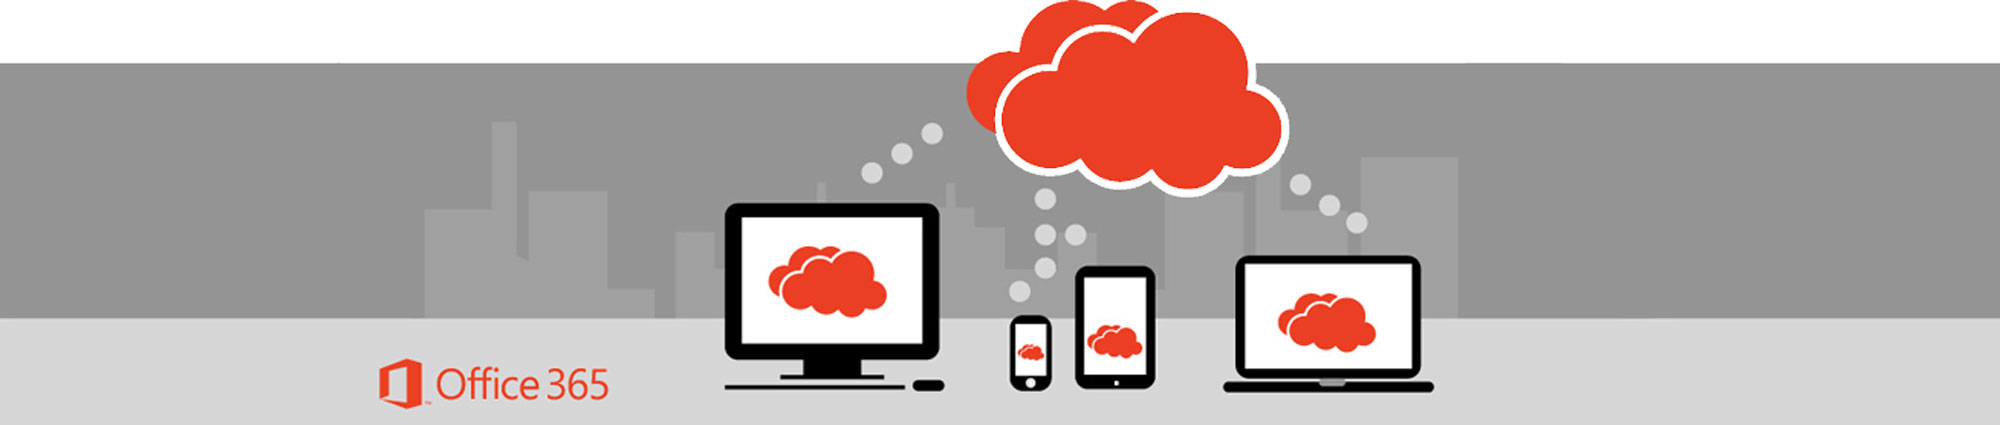 http://dpyxfisjd0mft.cloudfront.net/lab9-2/B2B/Sliders_B2B/Administratie%20voor%20KMO/BannerOffice365.jpg?1455263260&w=2000&h=425